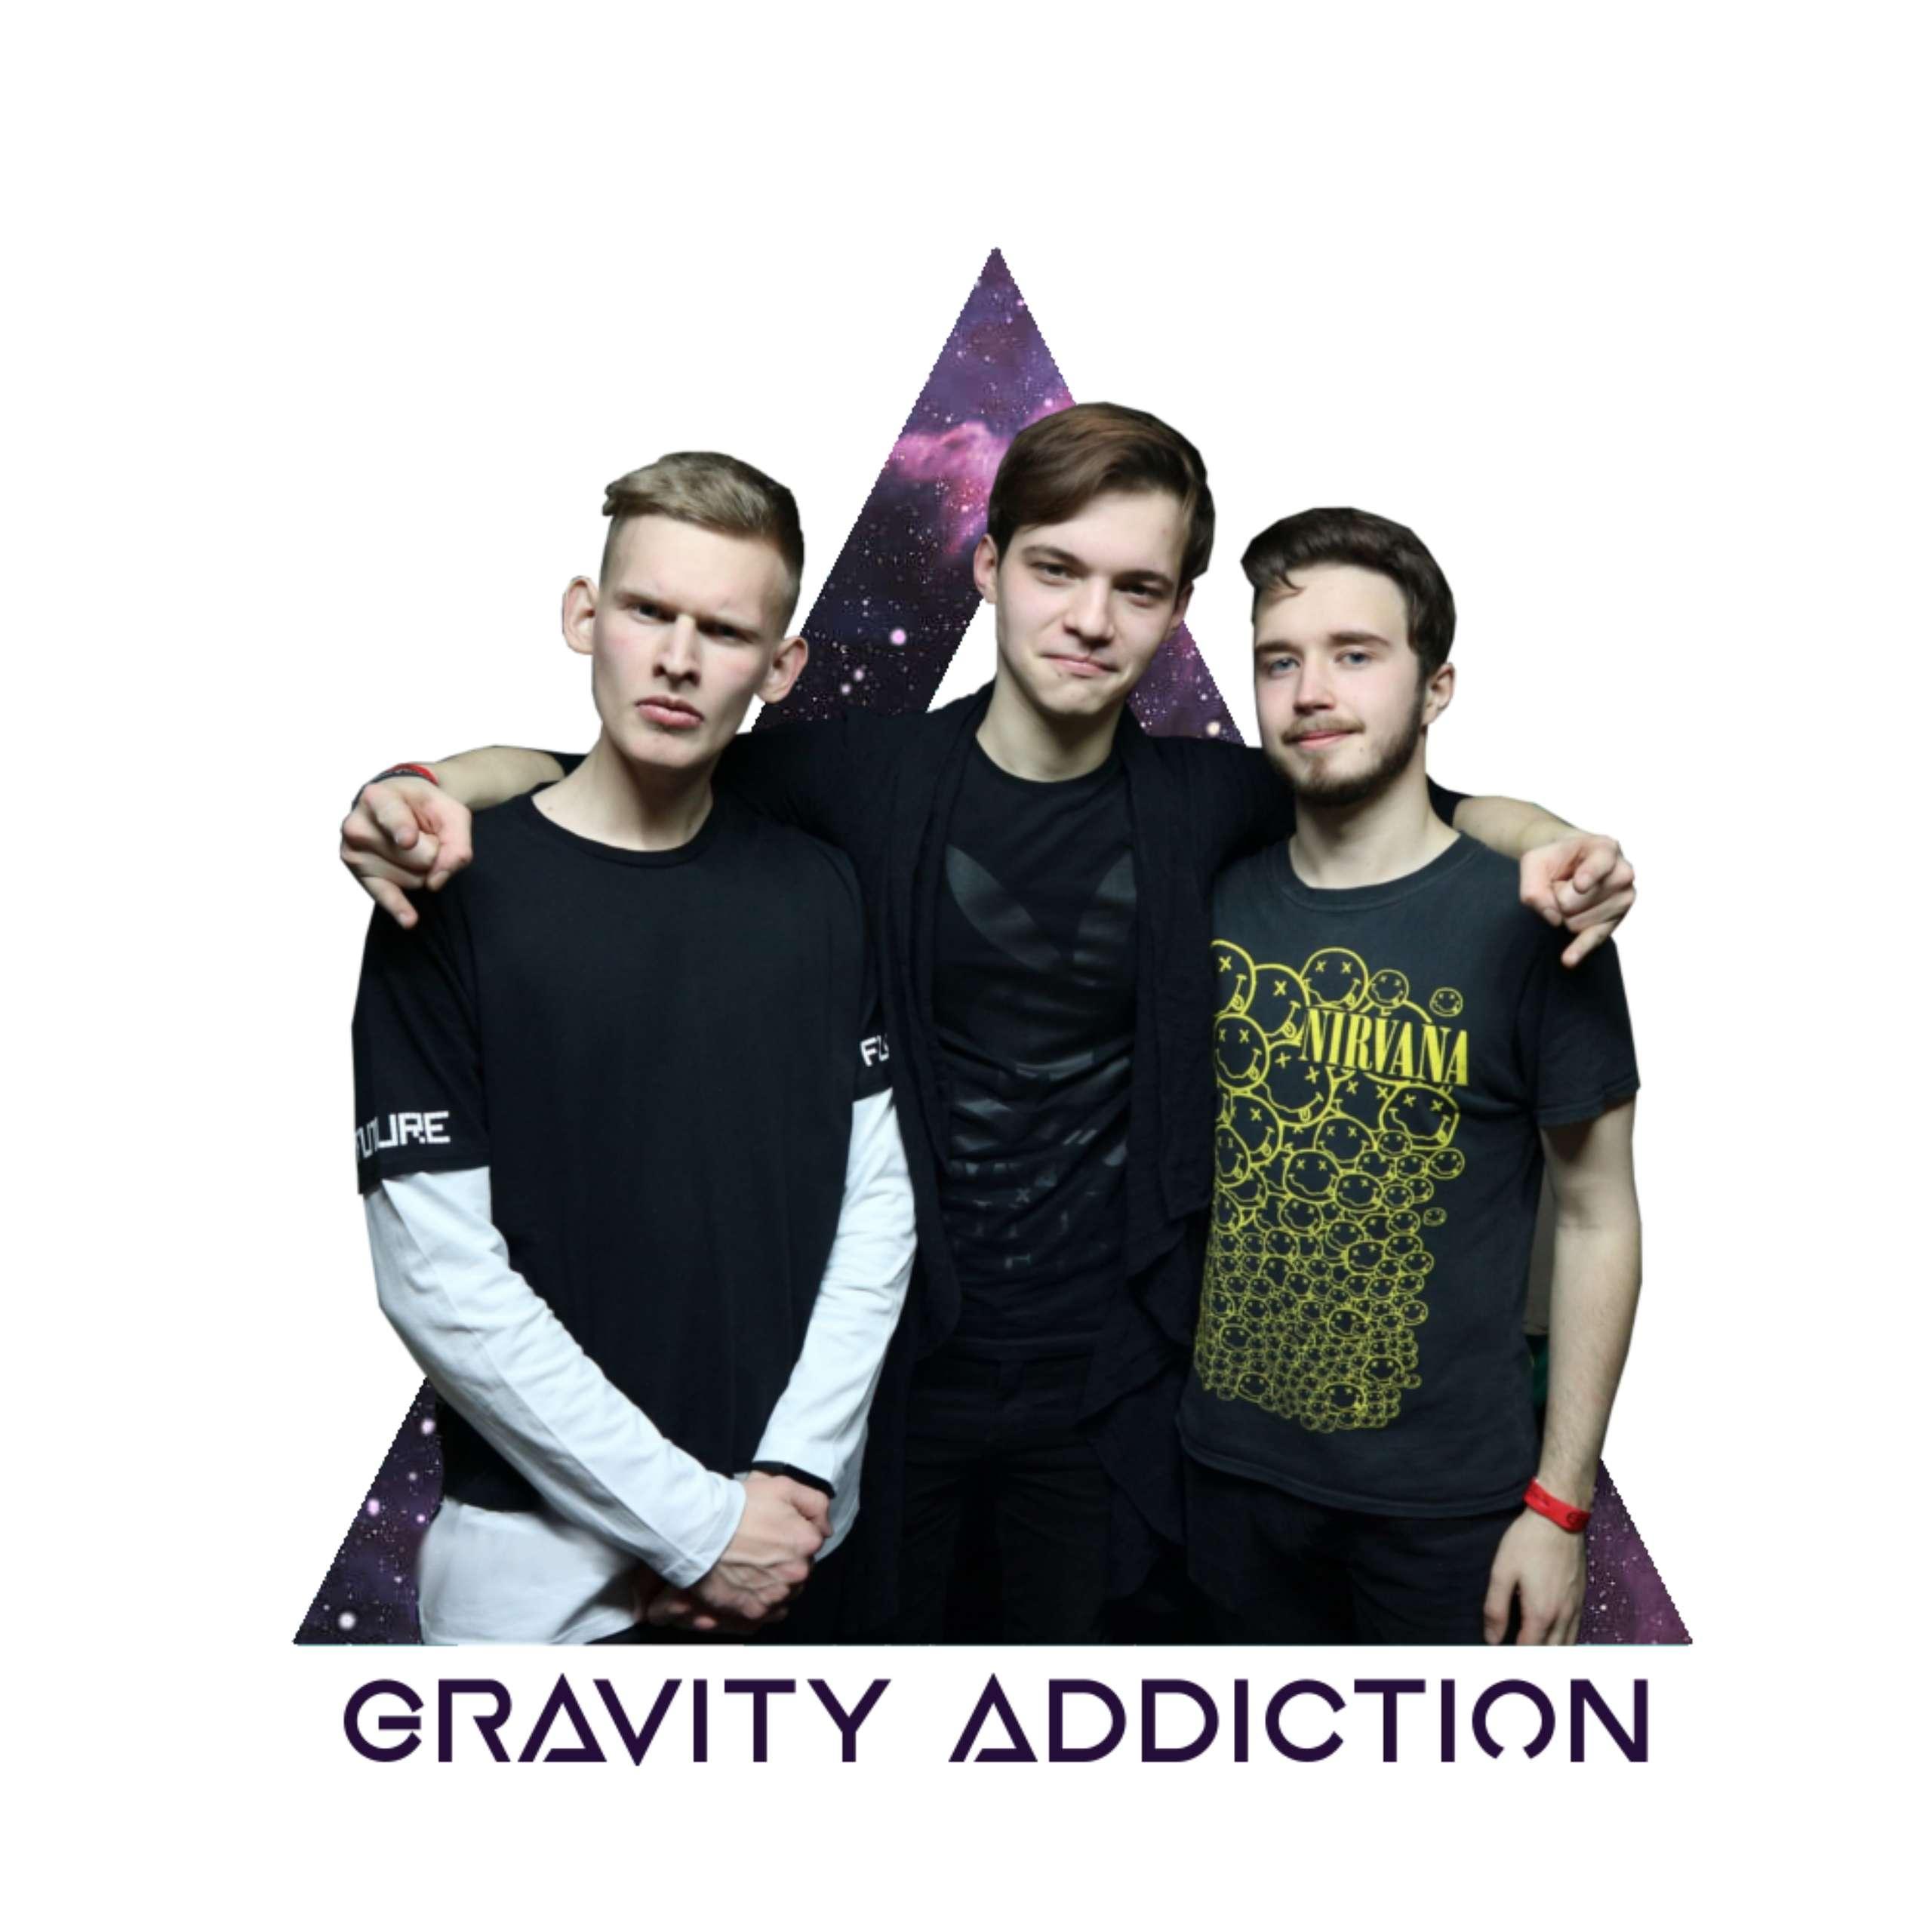 Gravity Addiction